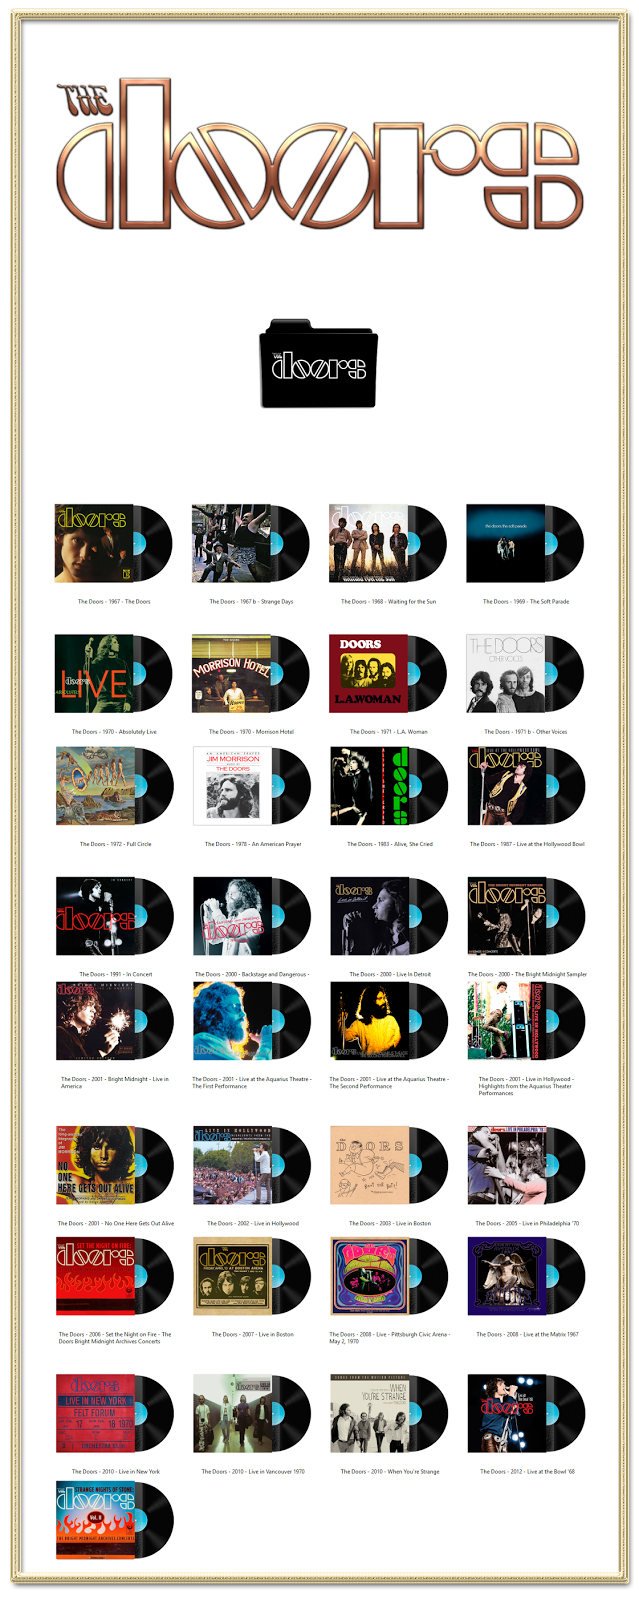 Album Art Icons The Doors Discography Folders (ICO ...  sc 1 st  Pinterest & Album Art Icons: The Doors Discography Folders (ICO \u0026 PNG) | Classic ...